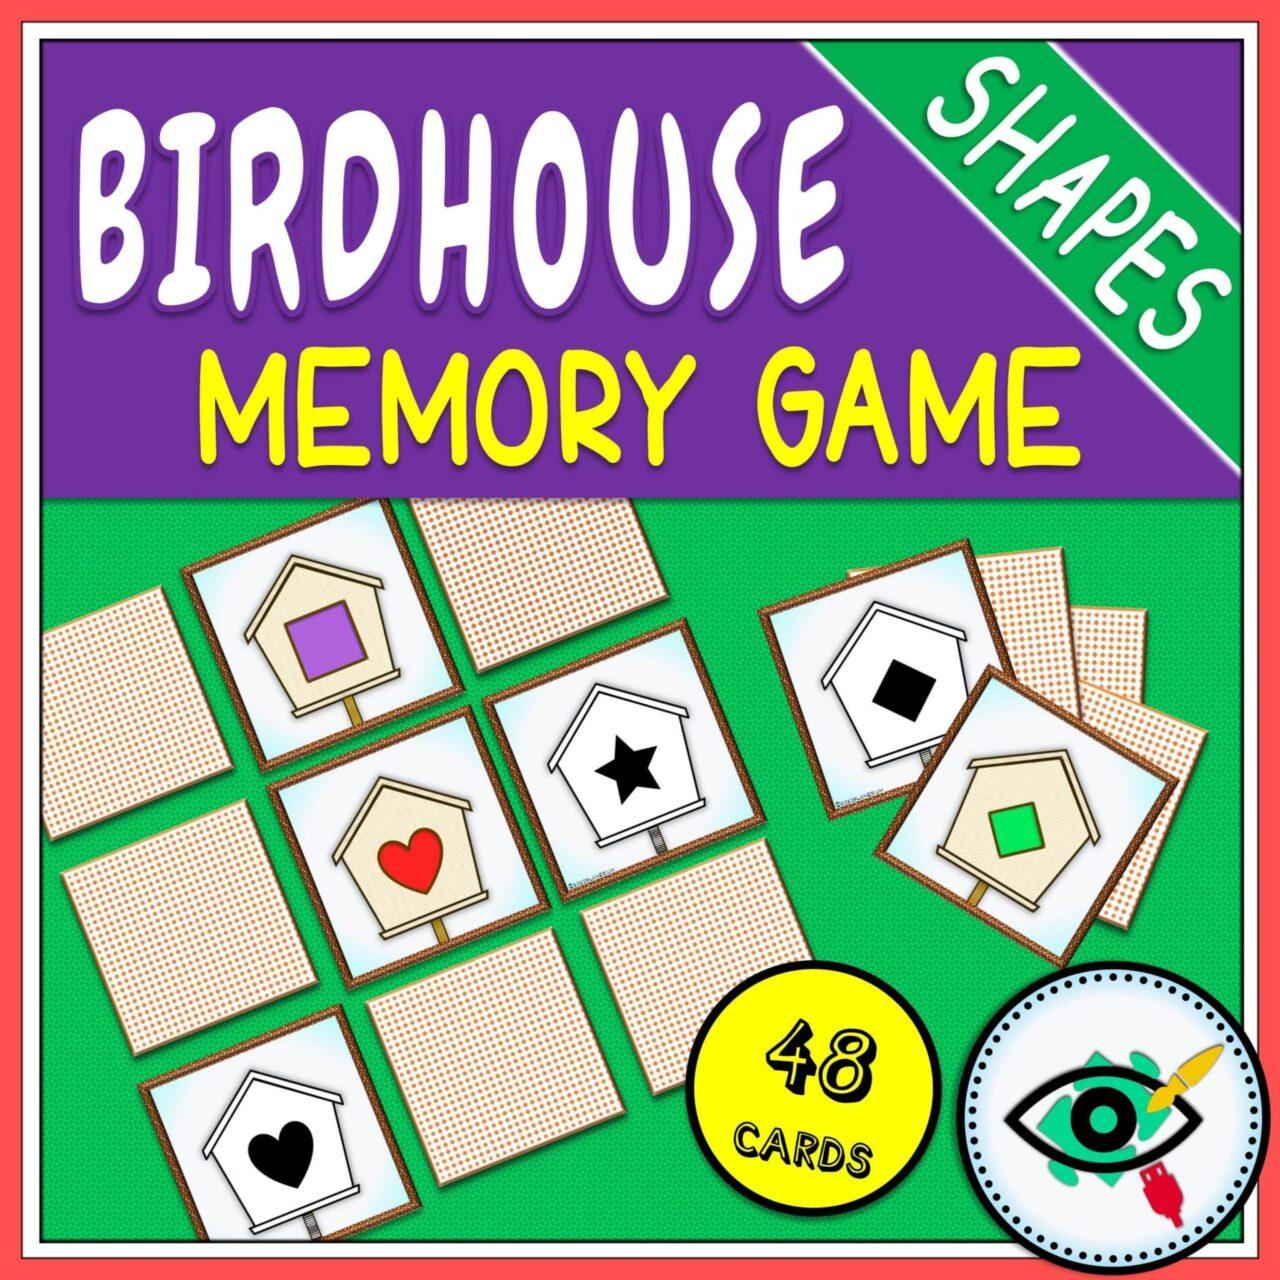 Spring - Memory Game - Birdhouse Shapes game | Planerium